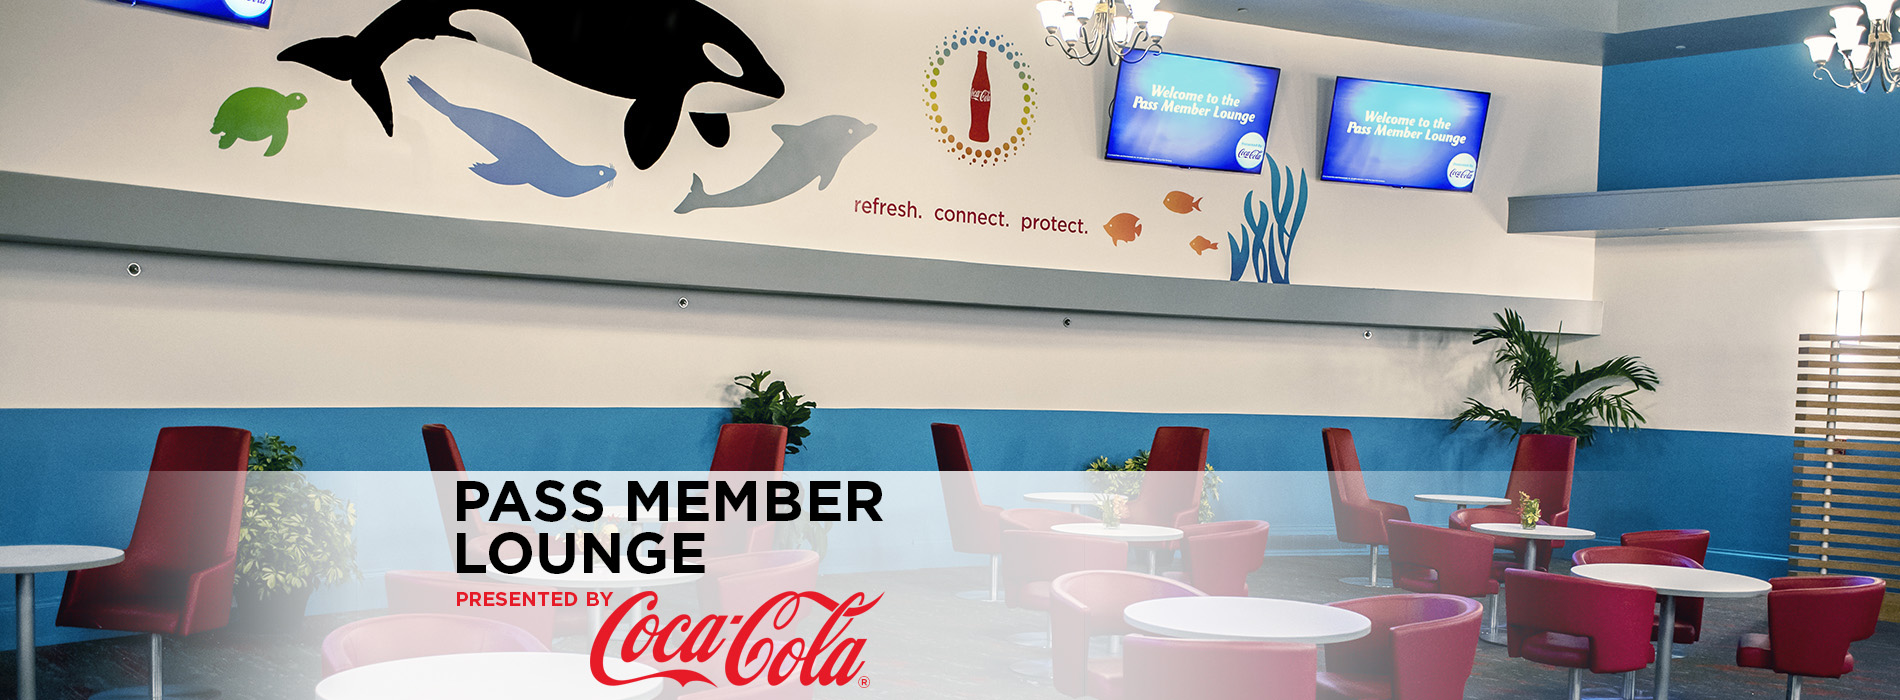 Pass Member Lounge